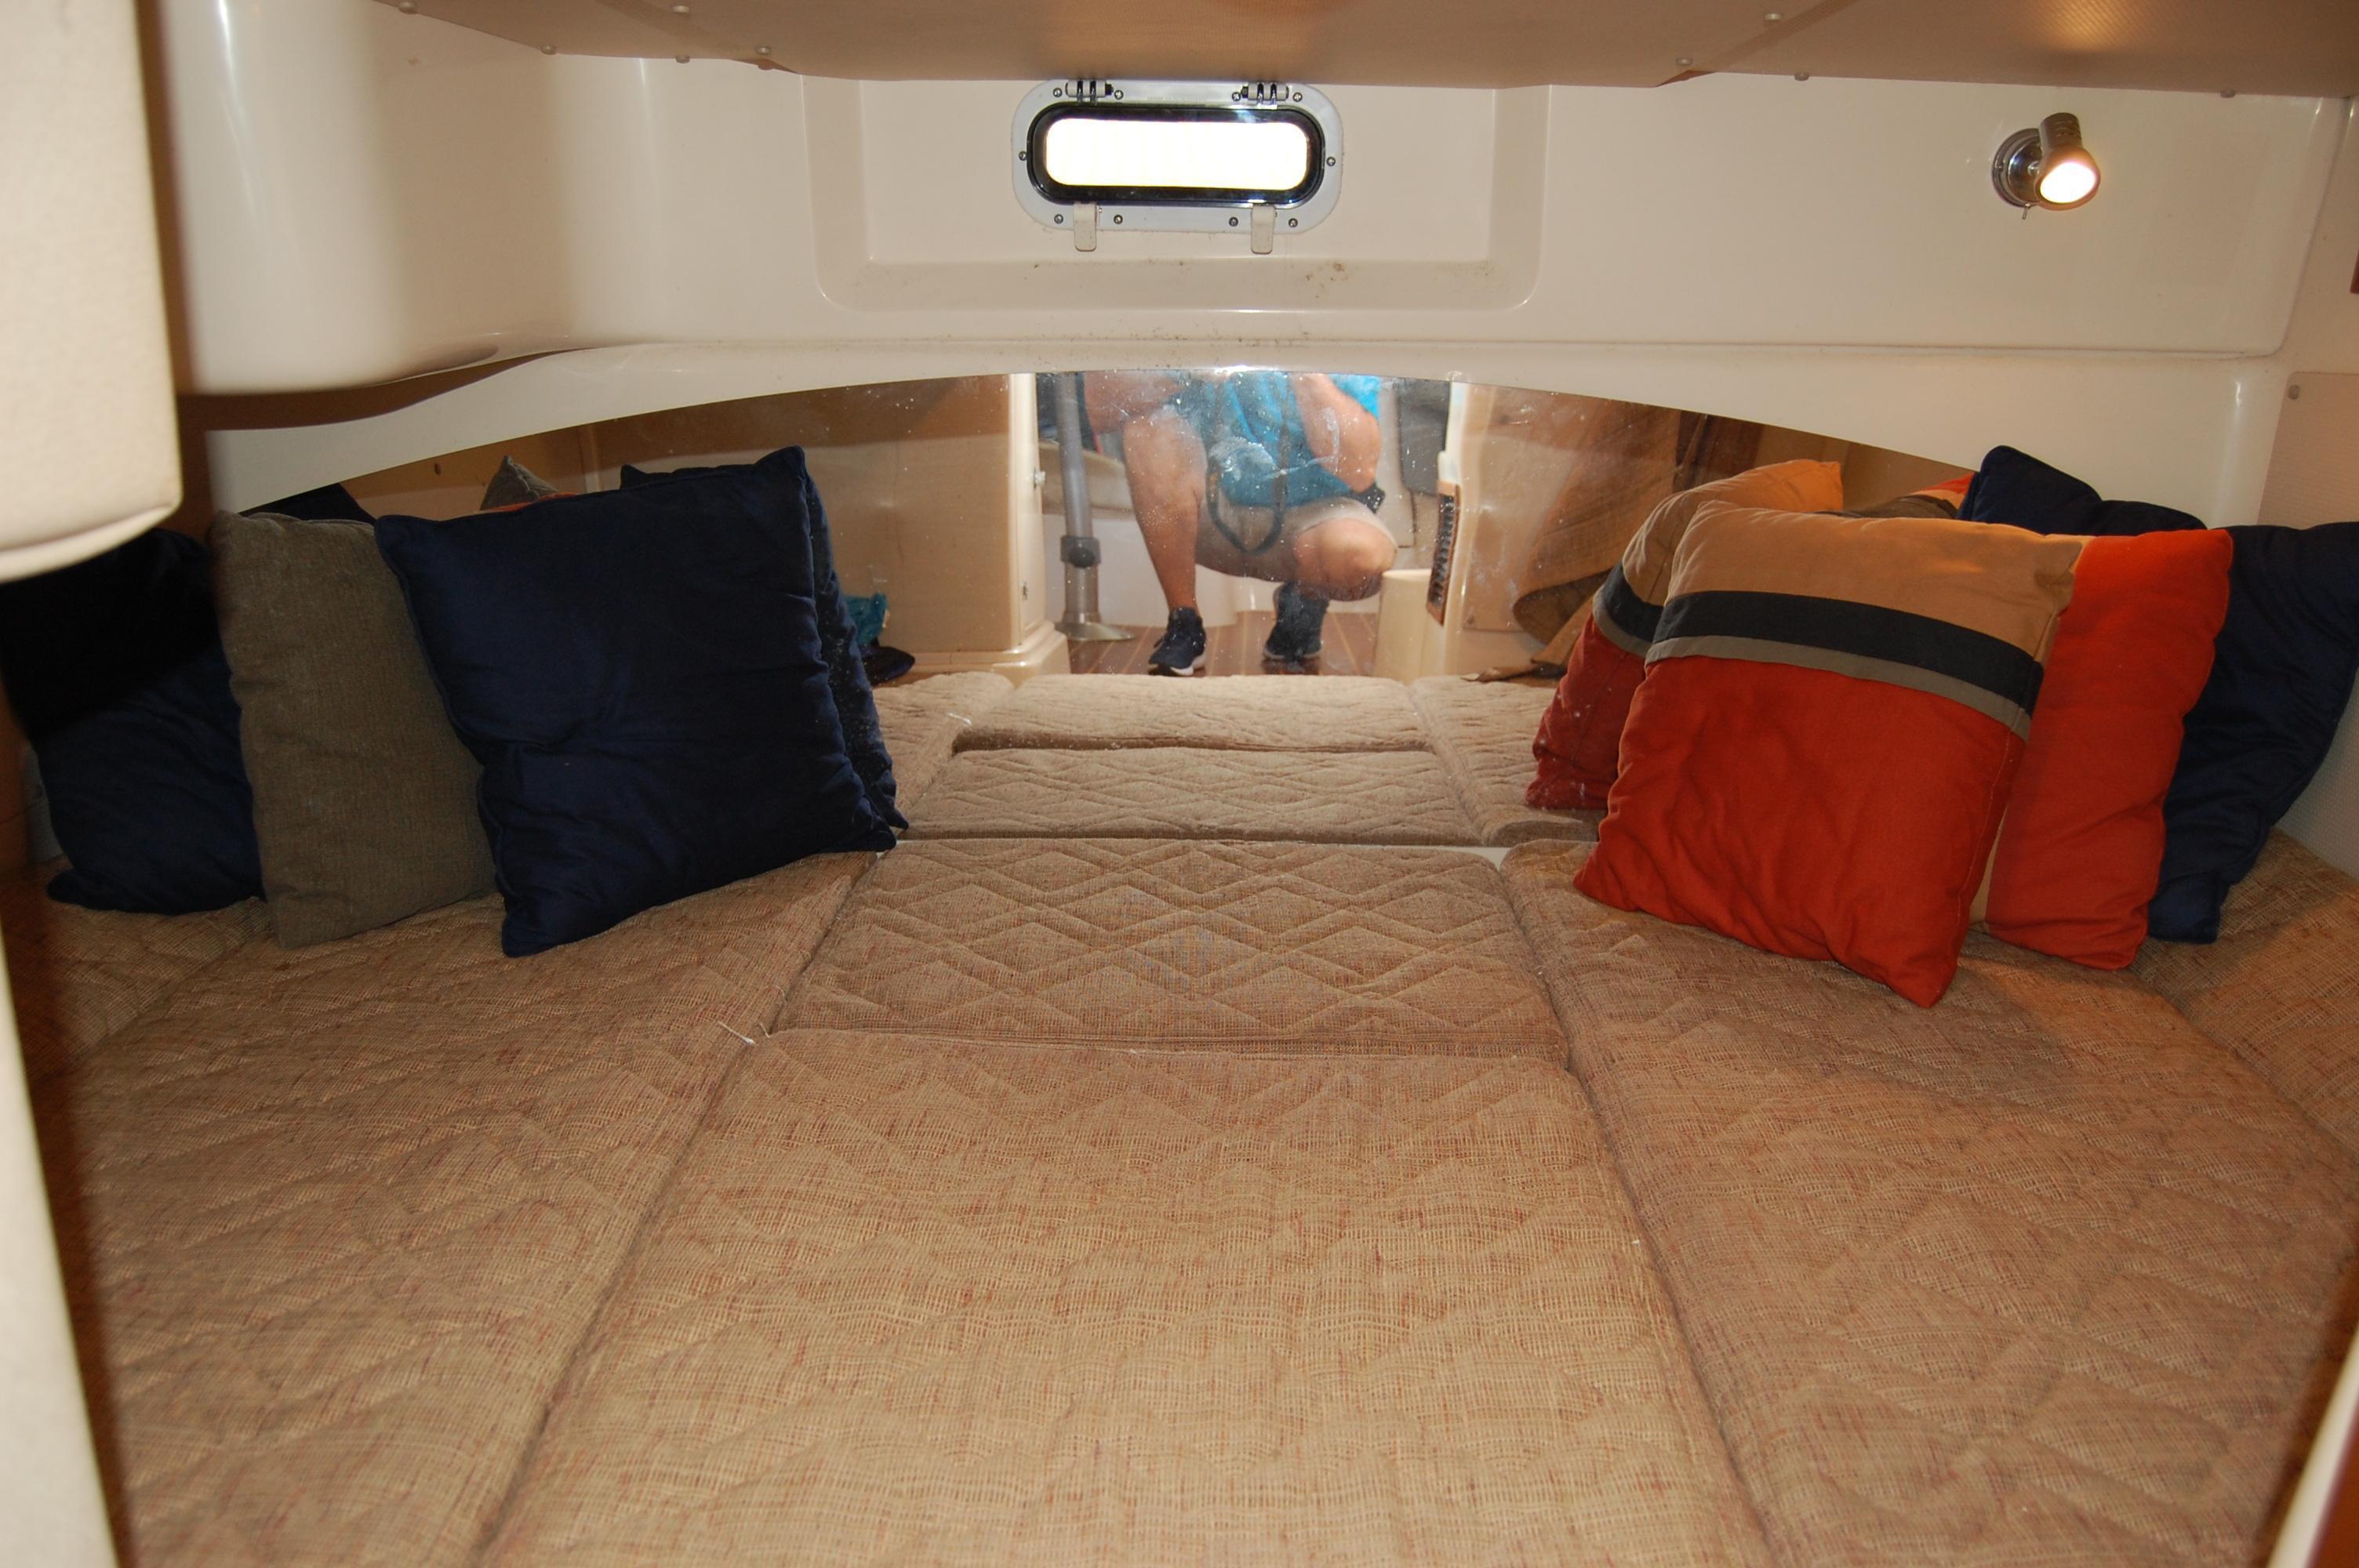 2002 Grady White 330 Express, mid-cabin sleep/storage compartment